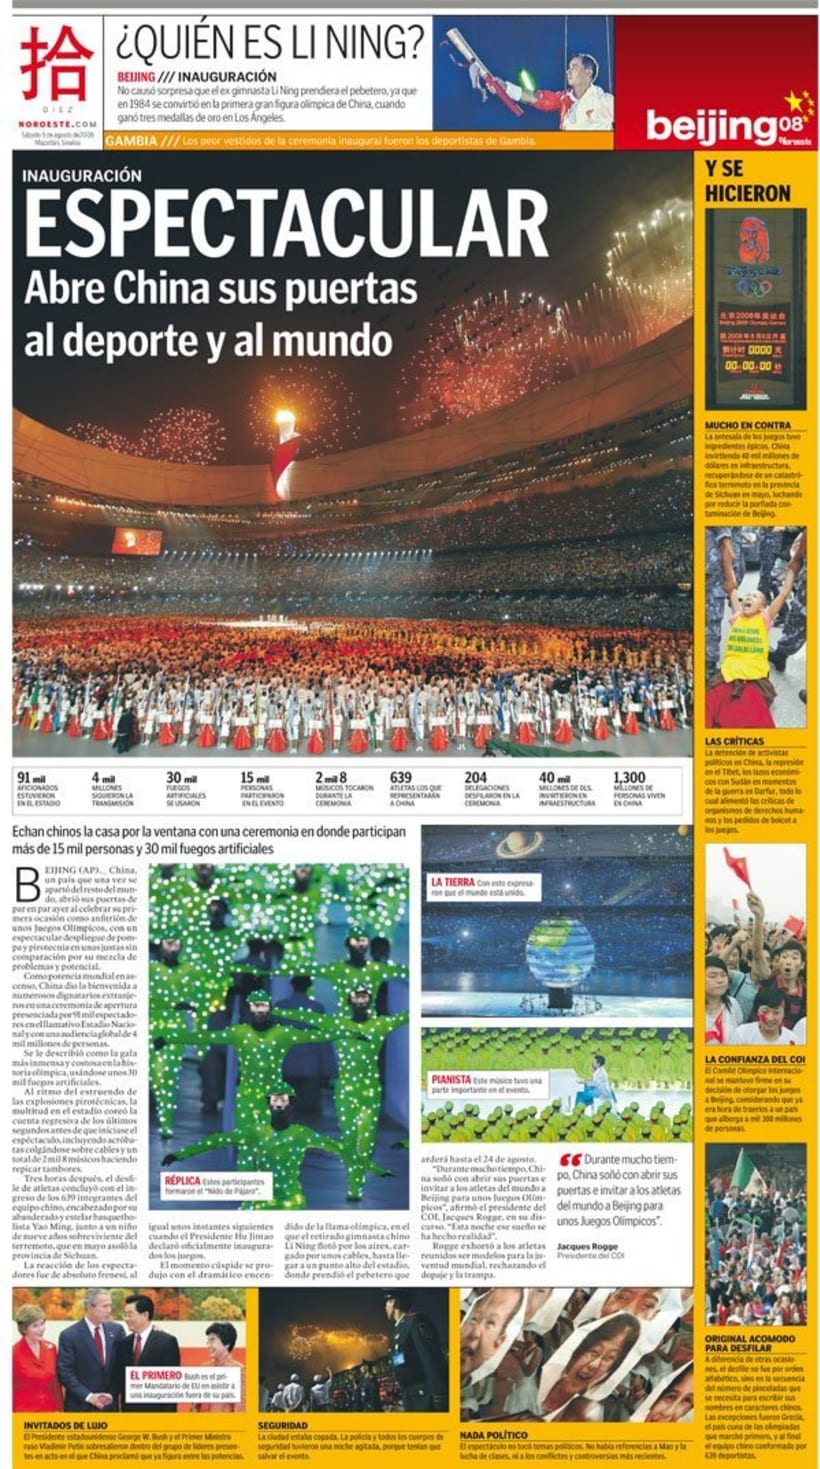 Olimpiadas Beijing 2008 23